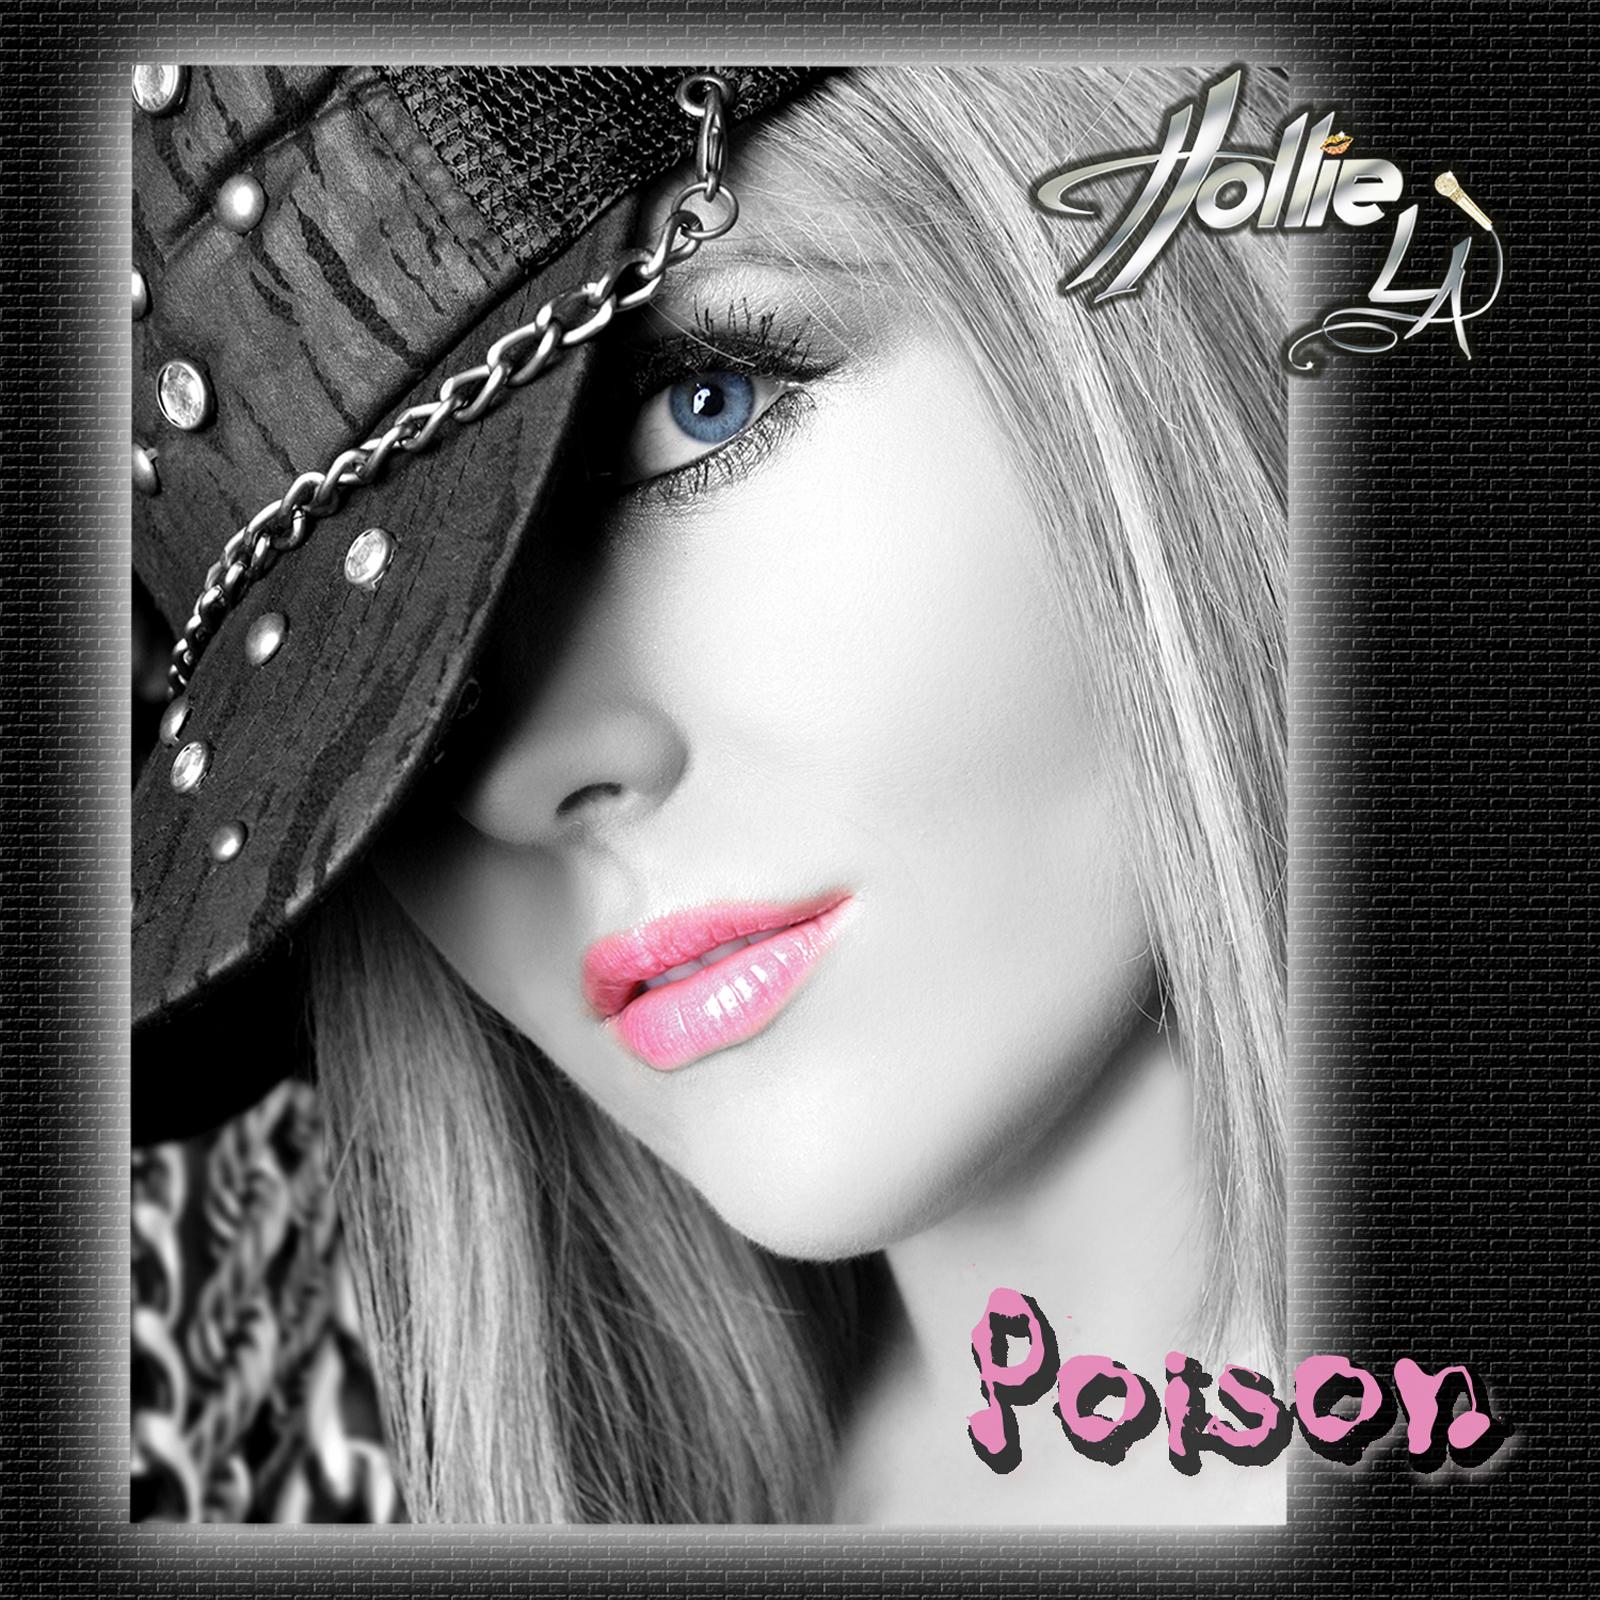 Poison by Hollie LA